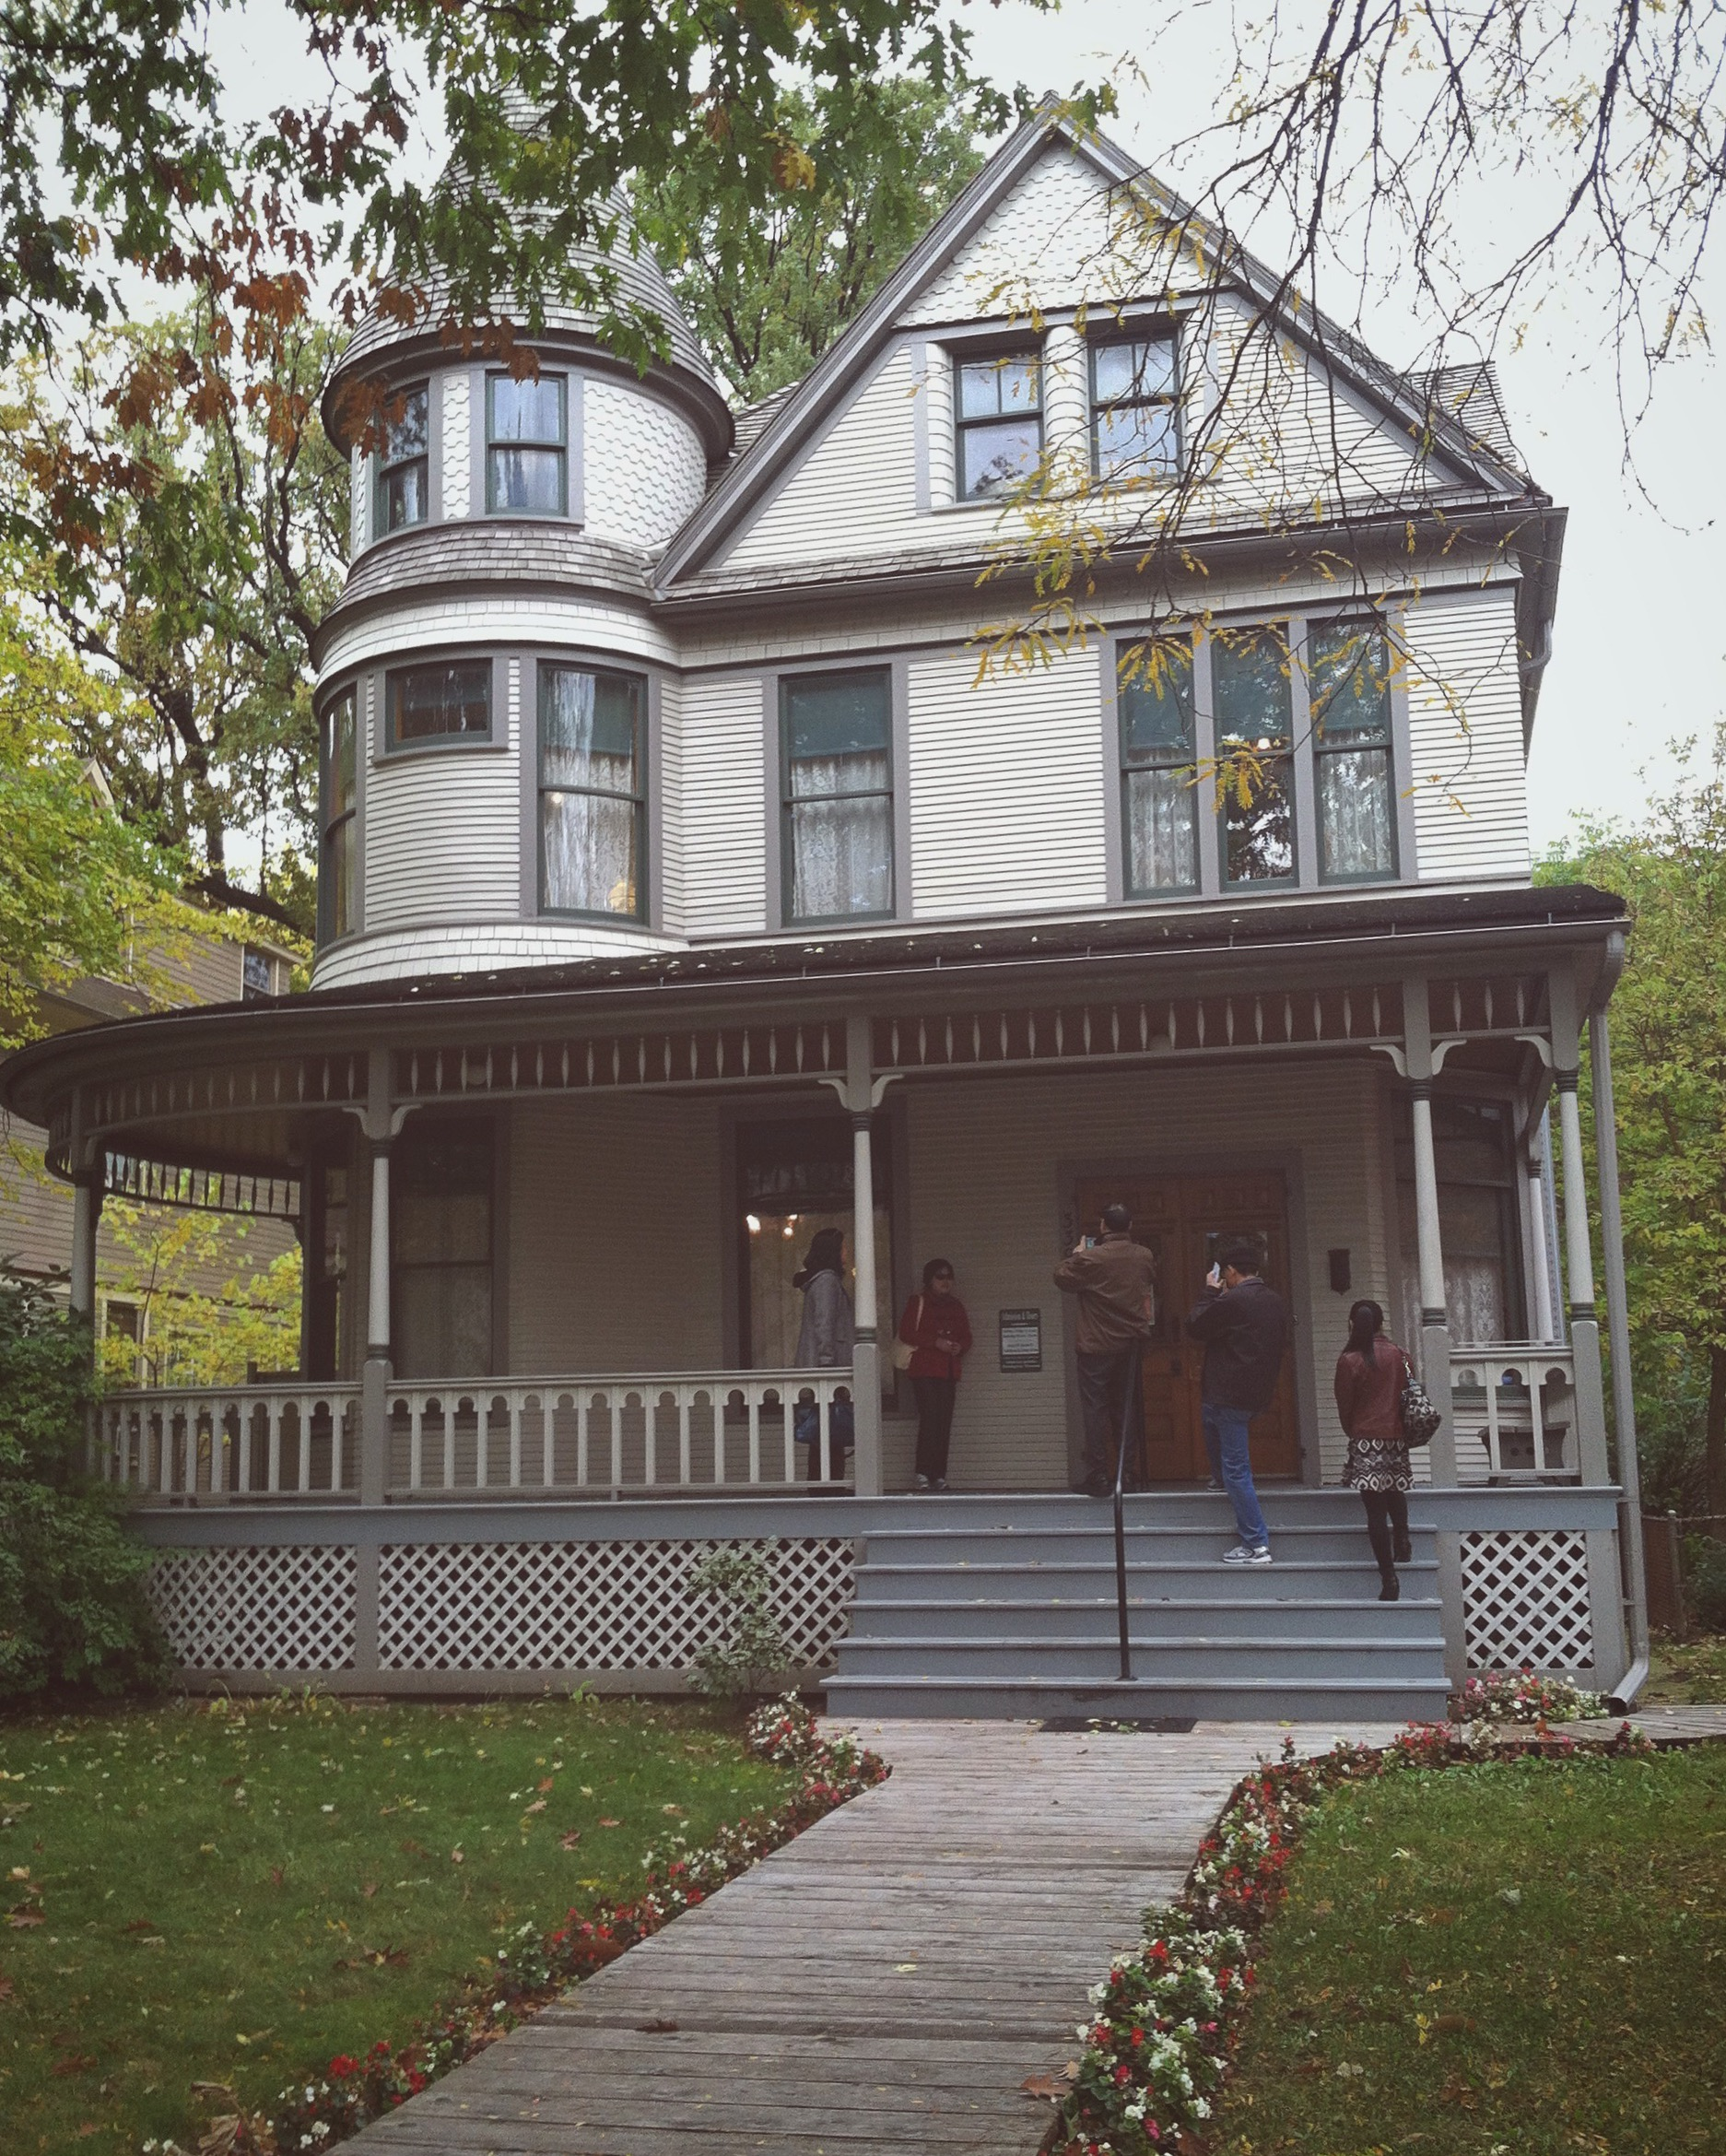 Ernest Hemingway's birth home.